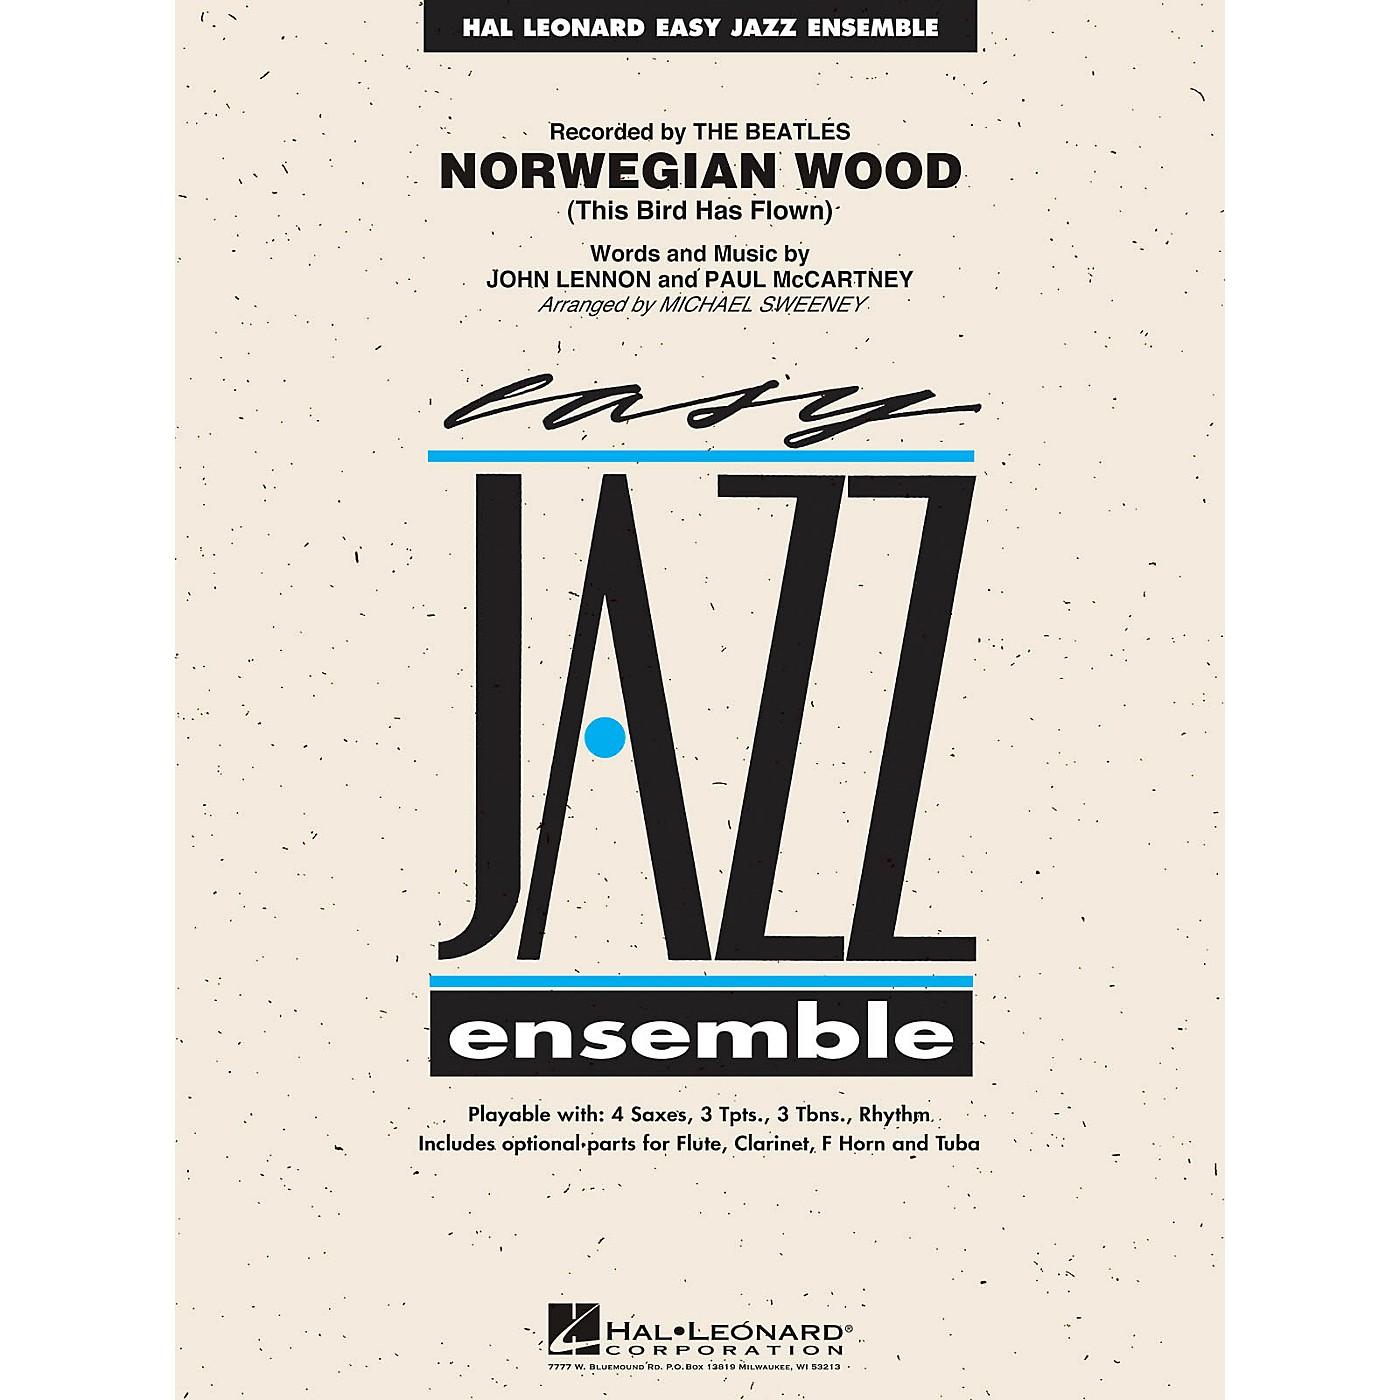 Hal Leonard Norwegian Wood (This Bird Has Flown) Jazz Band Level 2 Arranged by Michael Sweeney thumbnail